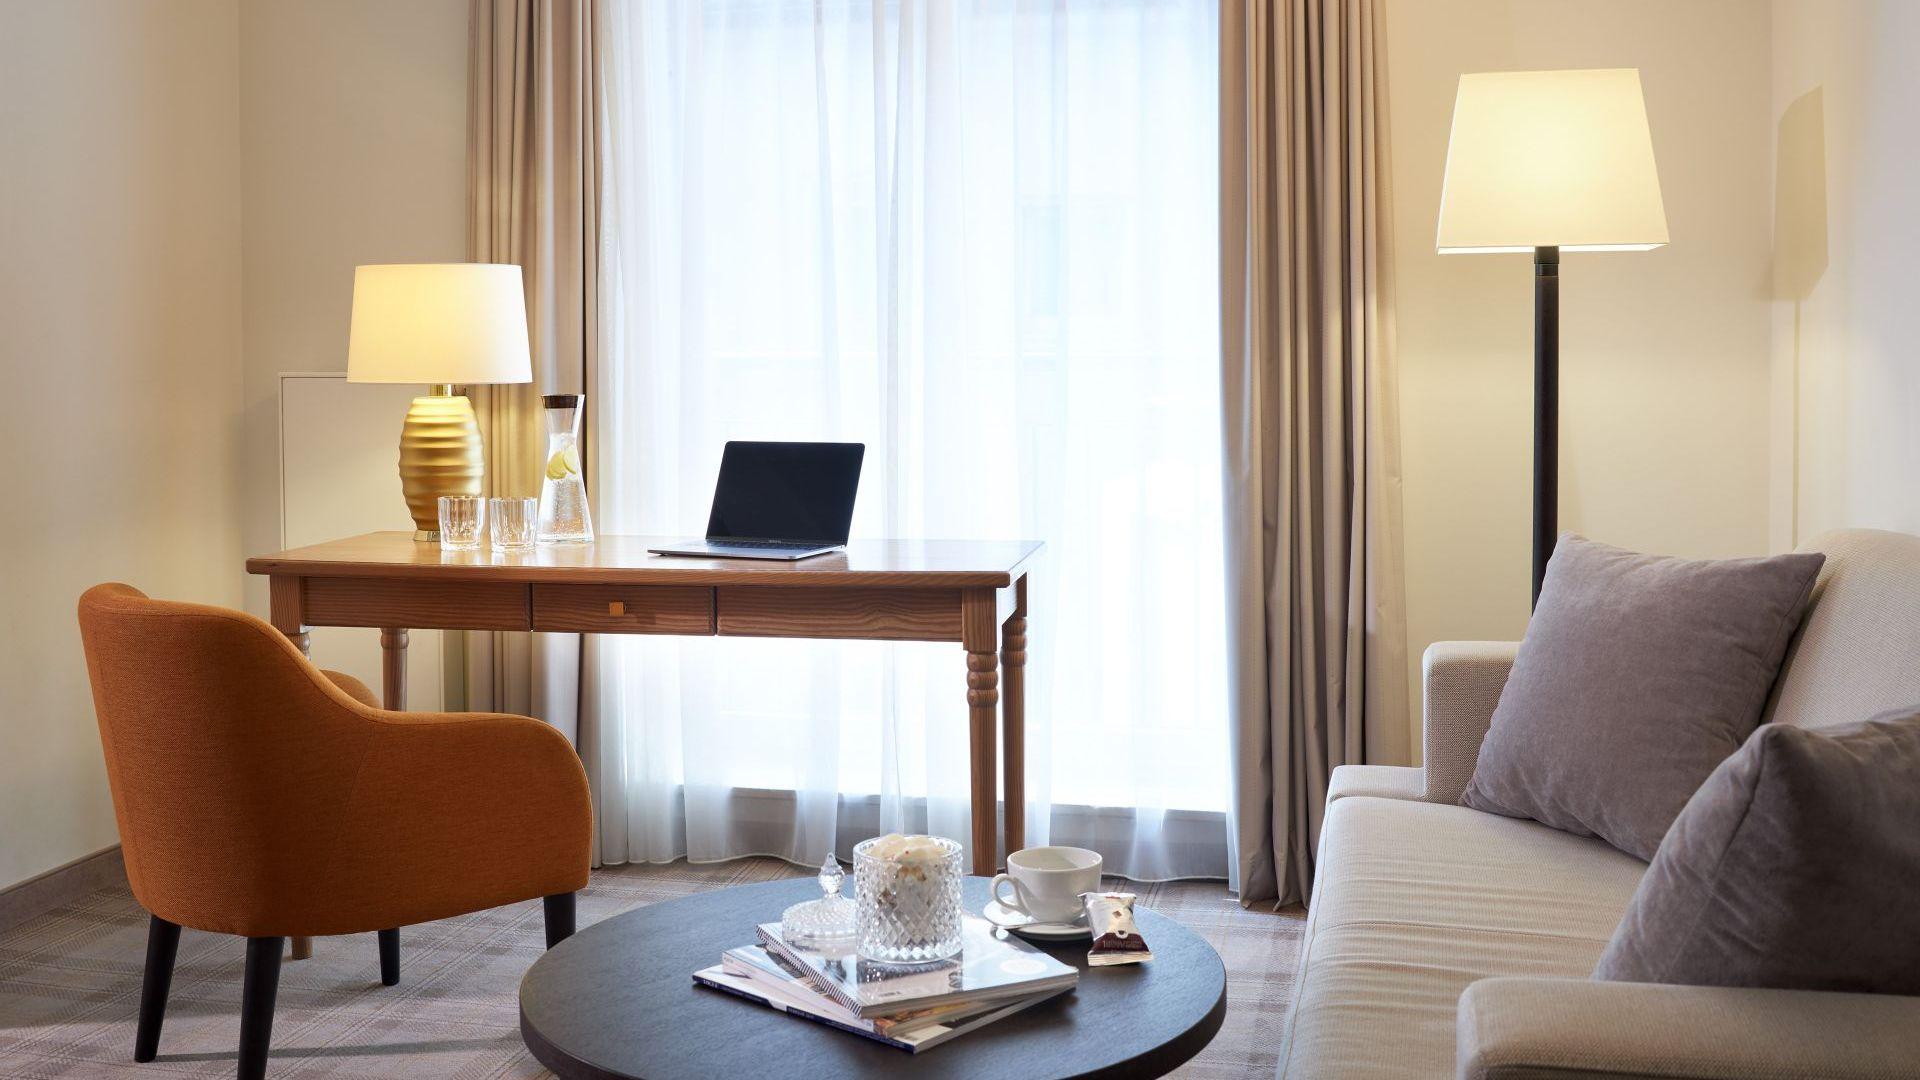 Classik-Hotel-Collection-Hackescher-Markt-Room-L-Living-Room